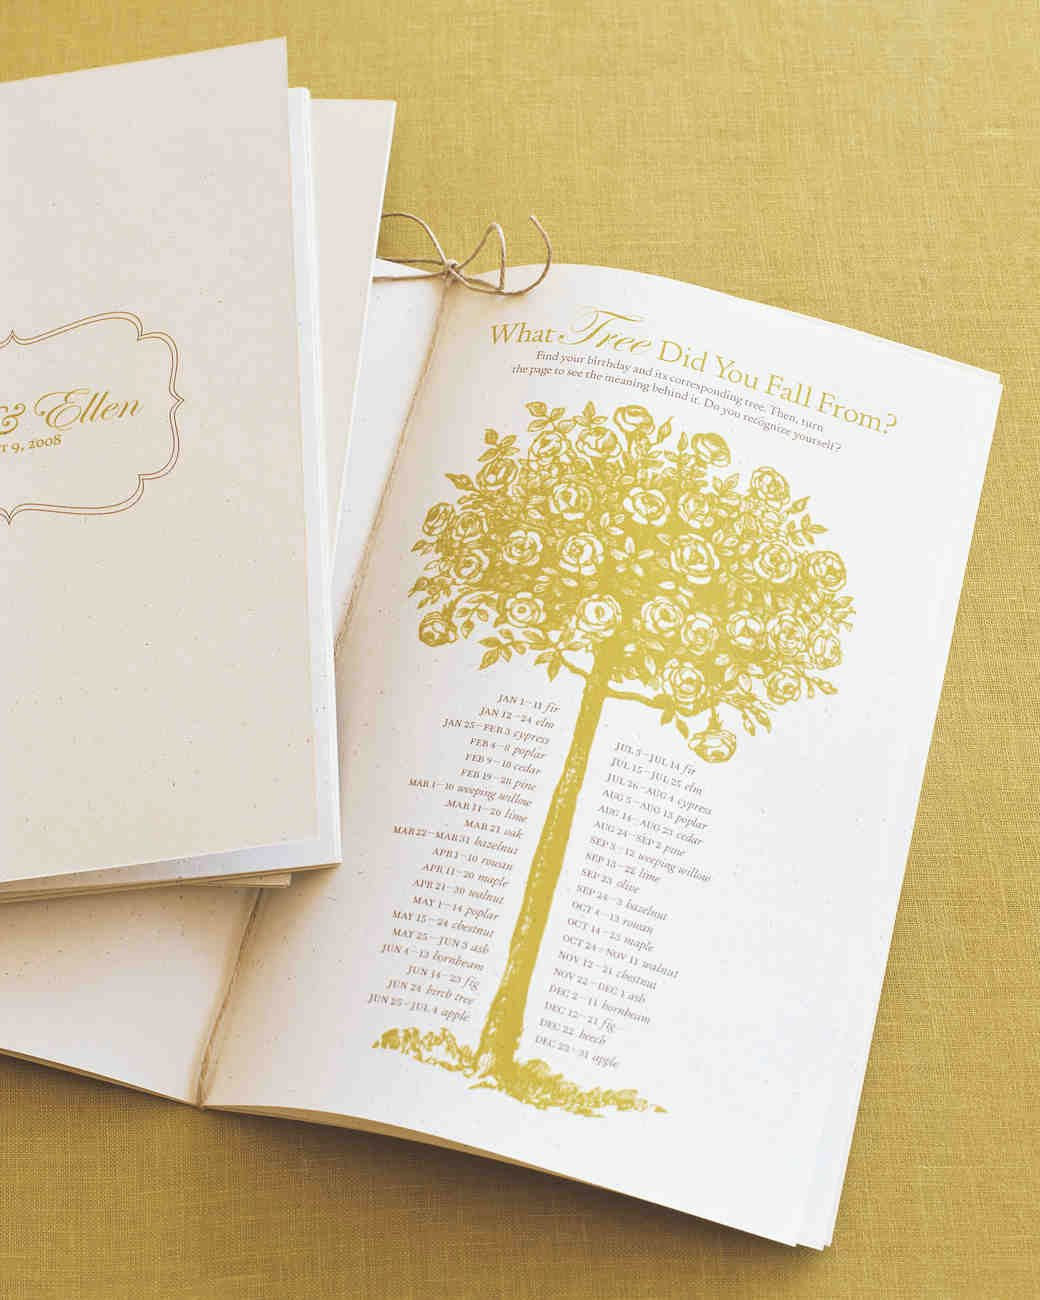 Diy Wedding Program Templates Free Best Of 25 Ways to Upgrade Your Diy Wedding Programs